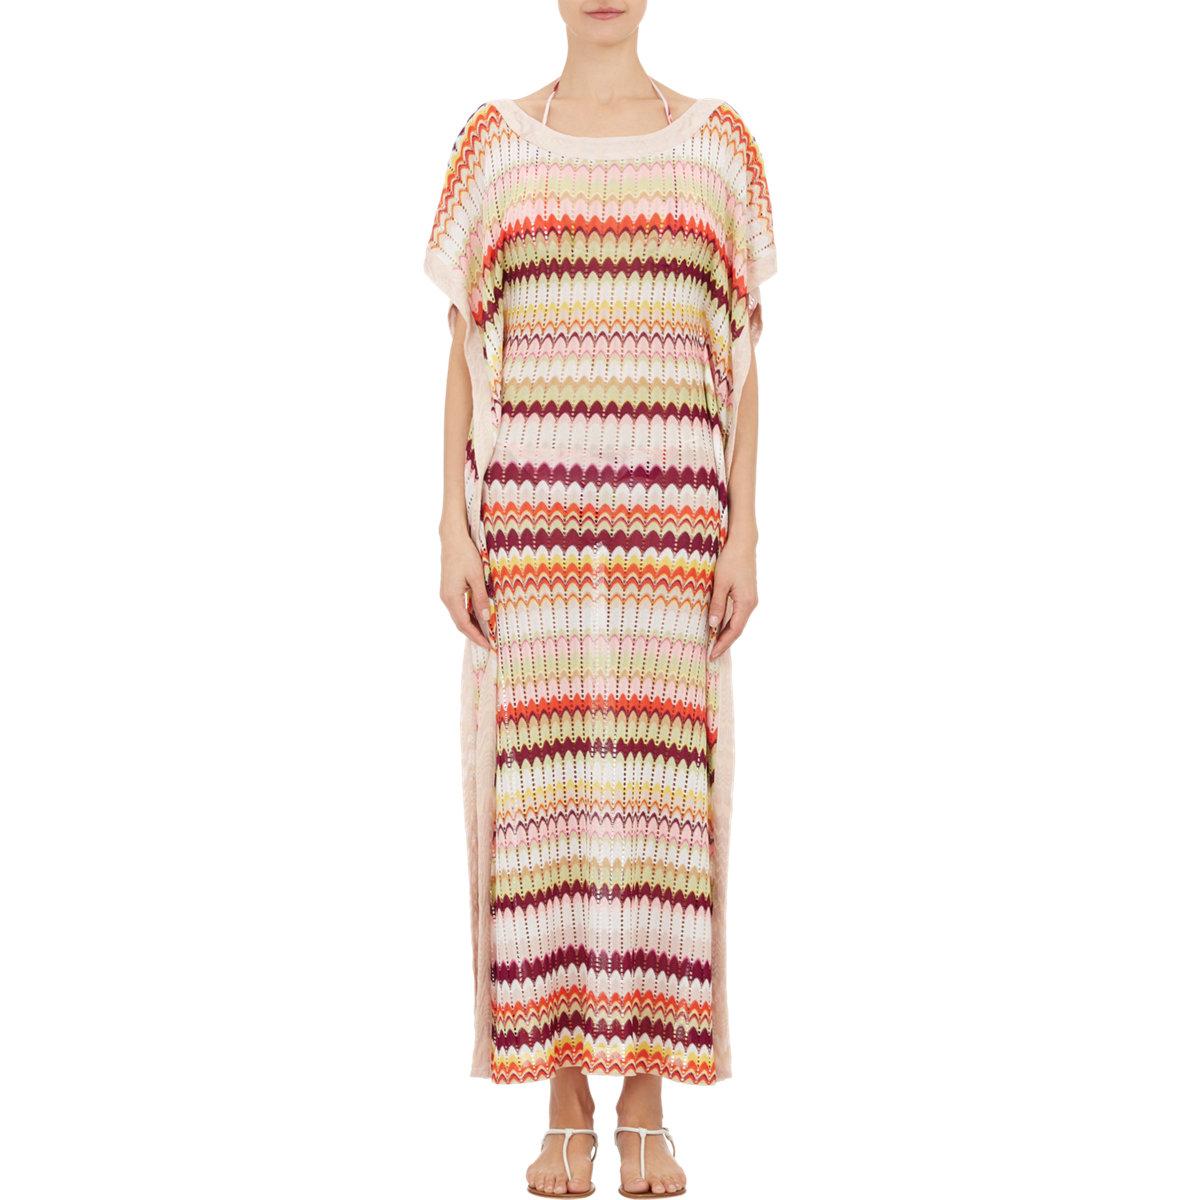 635814c8e34aa Missoni Women s Zigzag Knit Caftan in Pink - Lyst